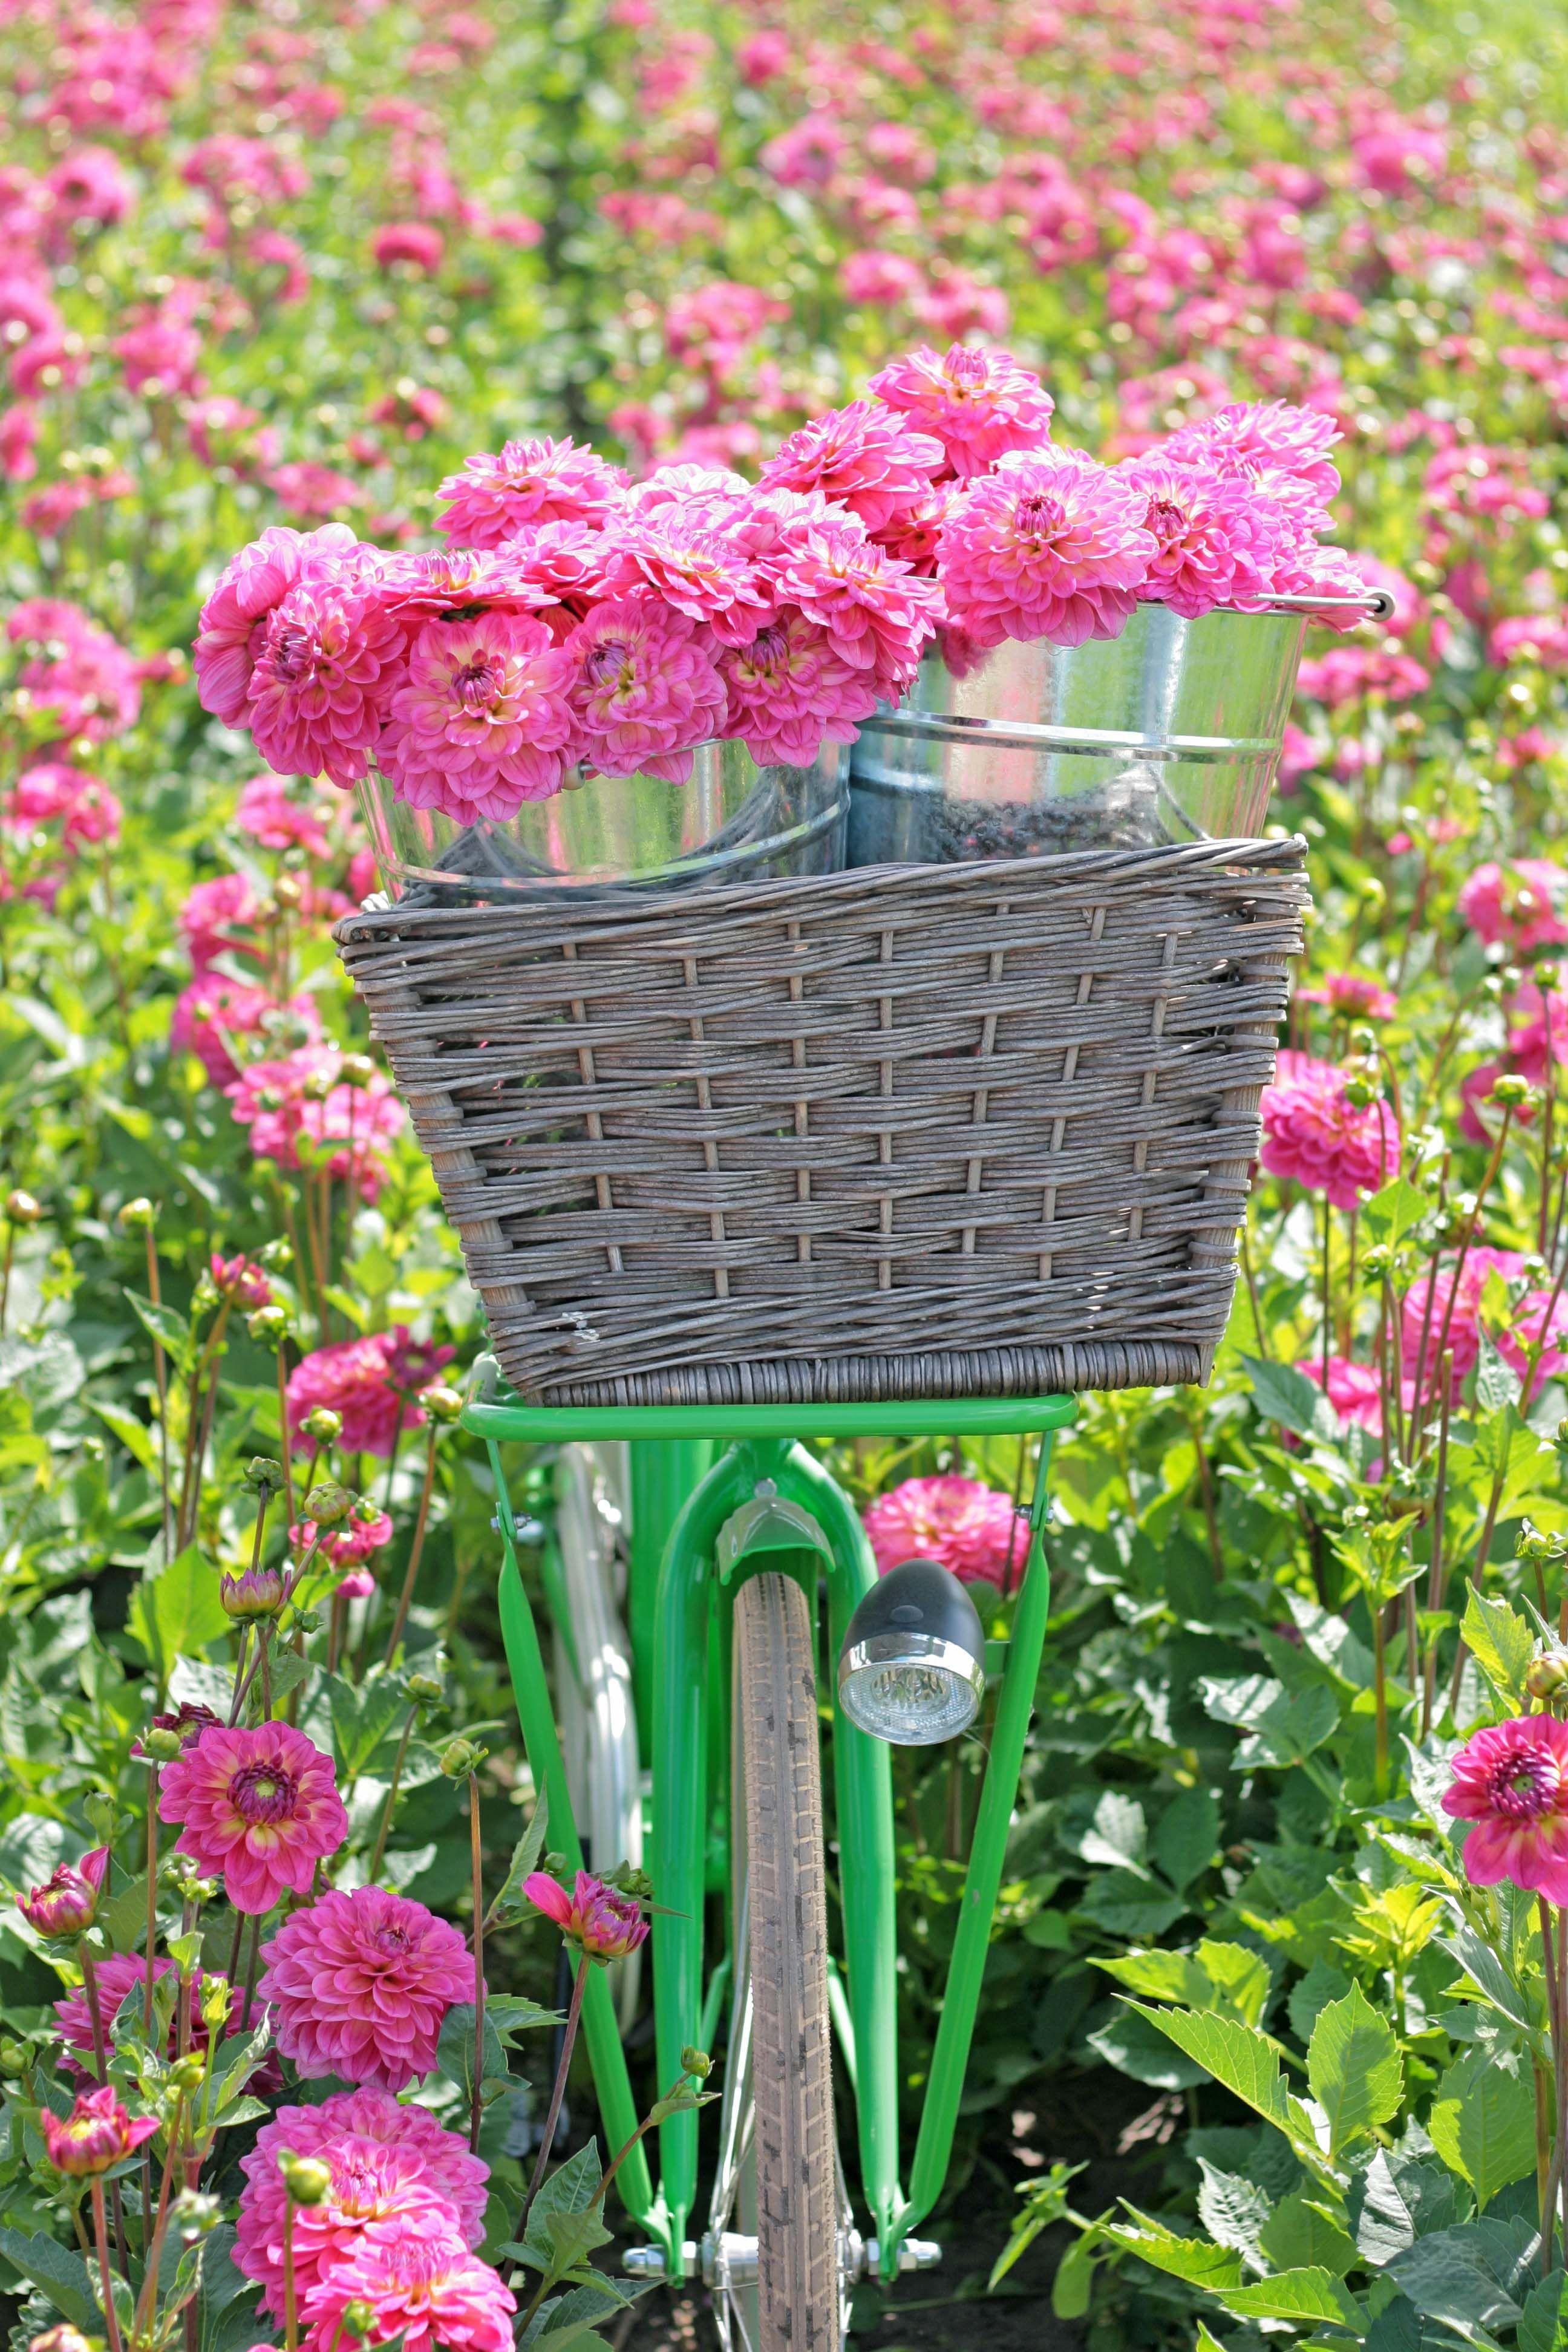 Loads Of Dahlias Freshly Picked From A Huge Pink Flower Field Love